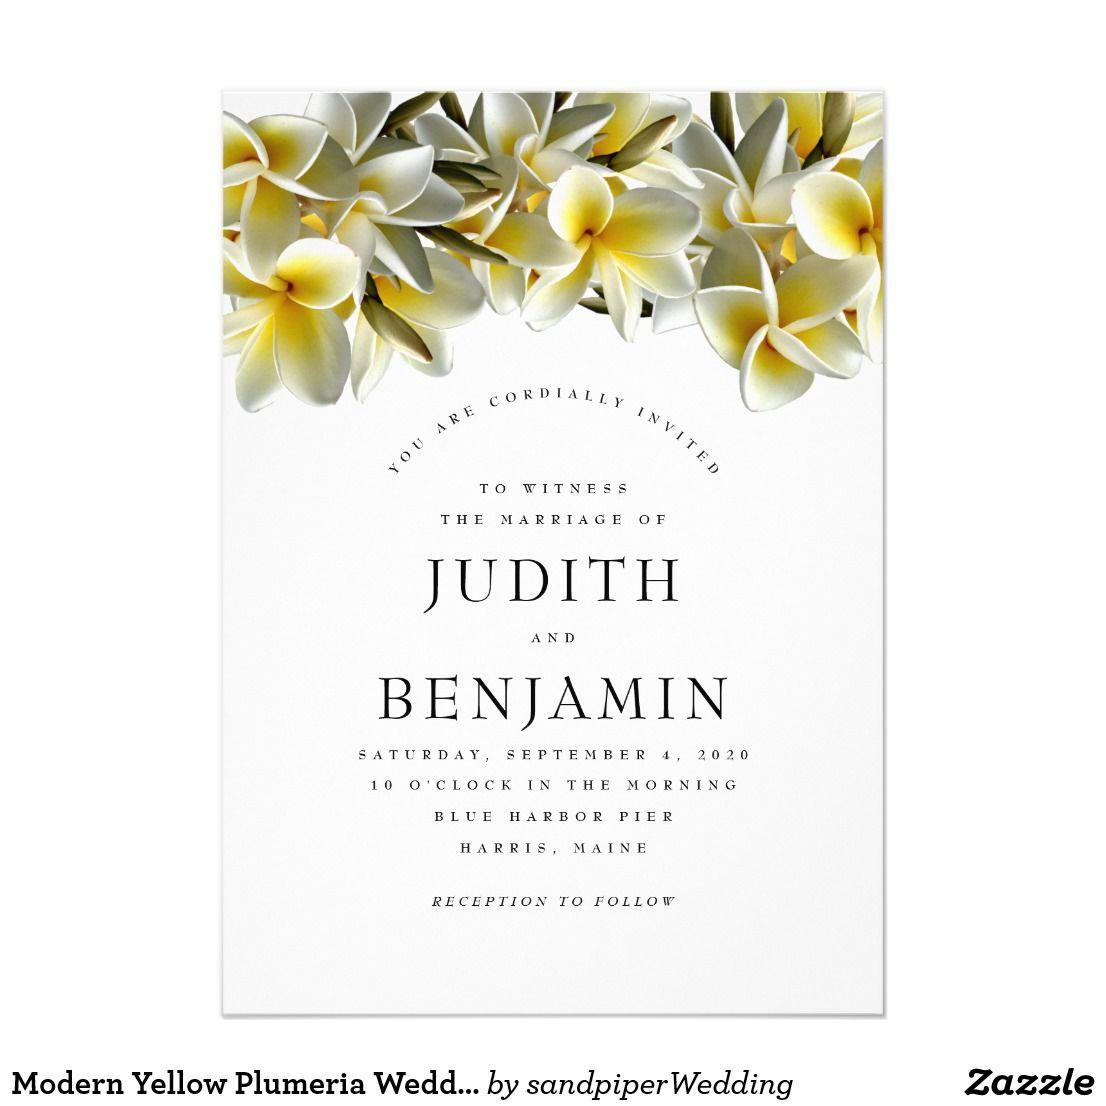 Modern Yellow Plumeria Wedding Invitation | Designer Wedding ...